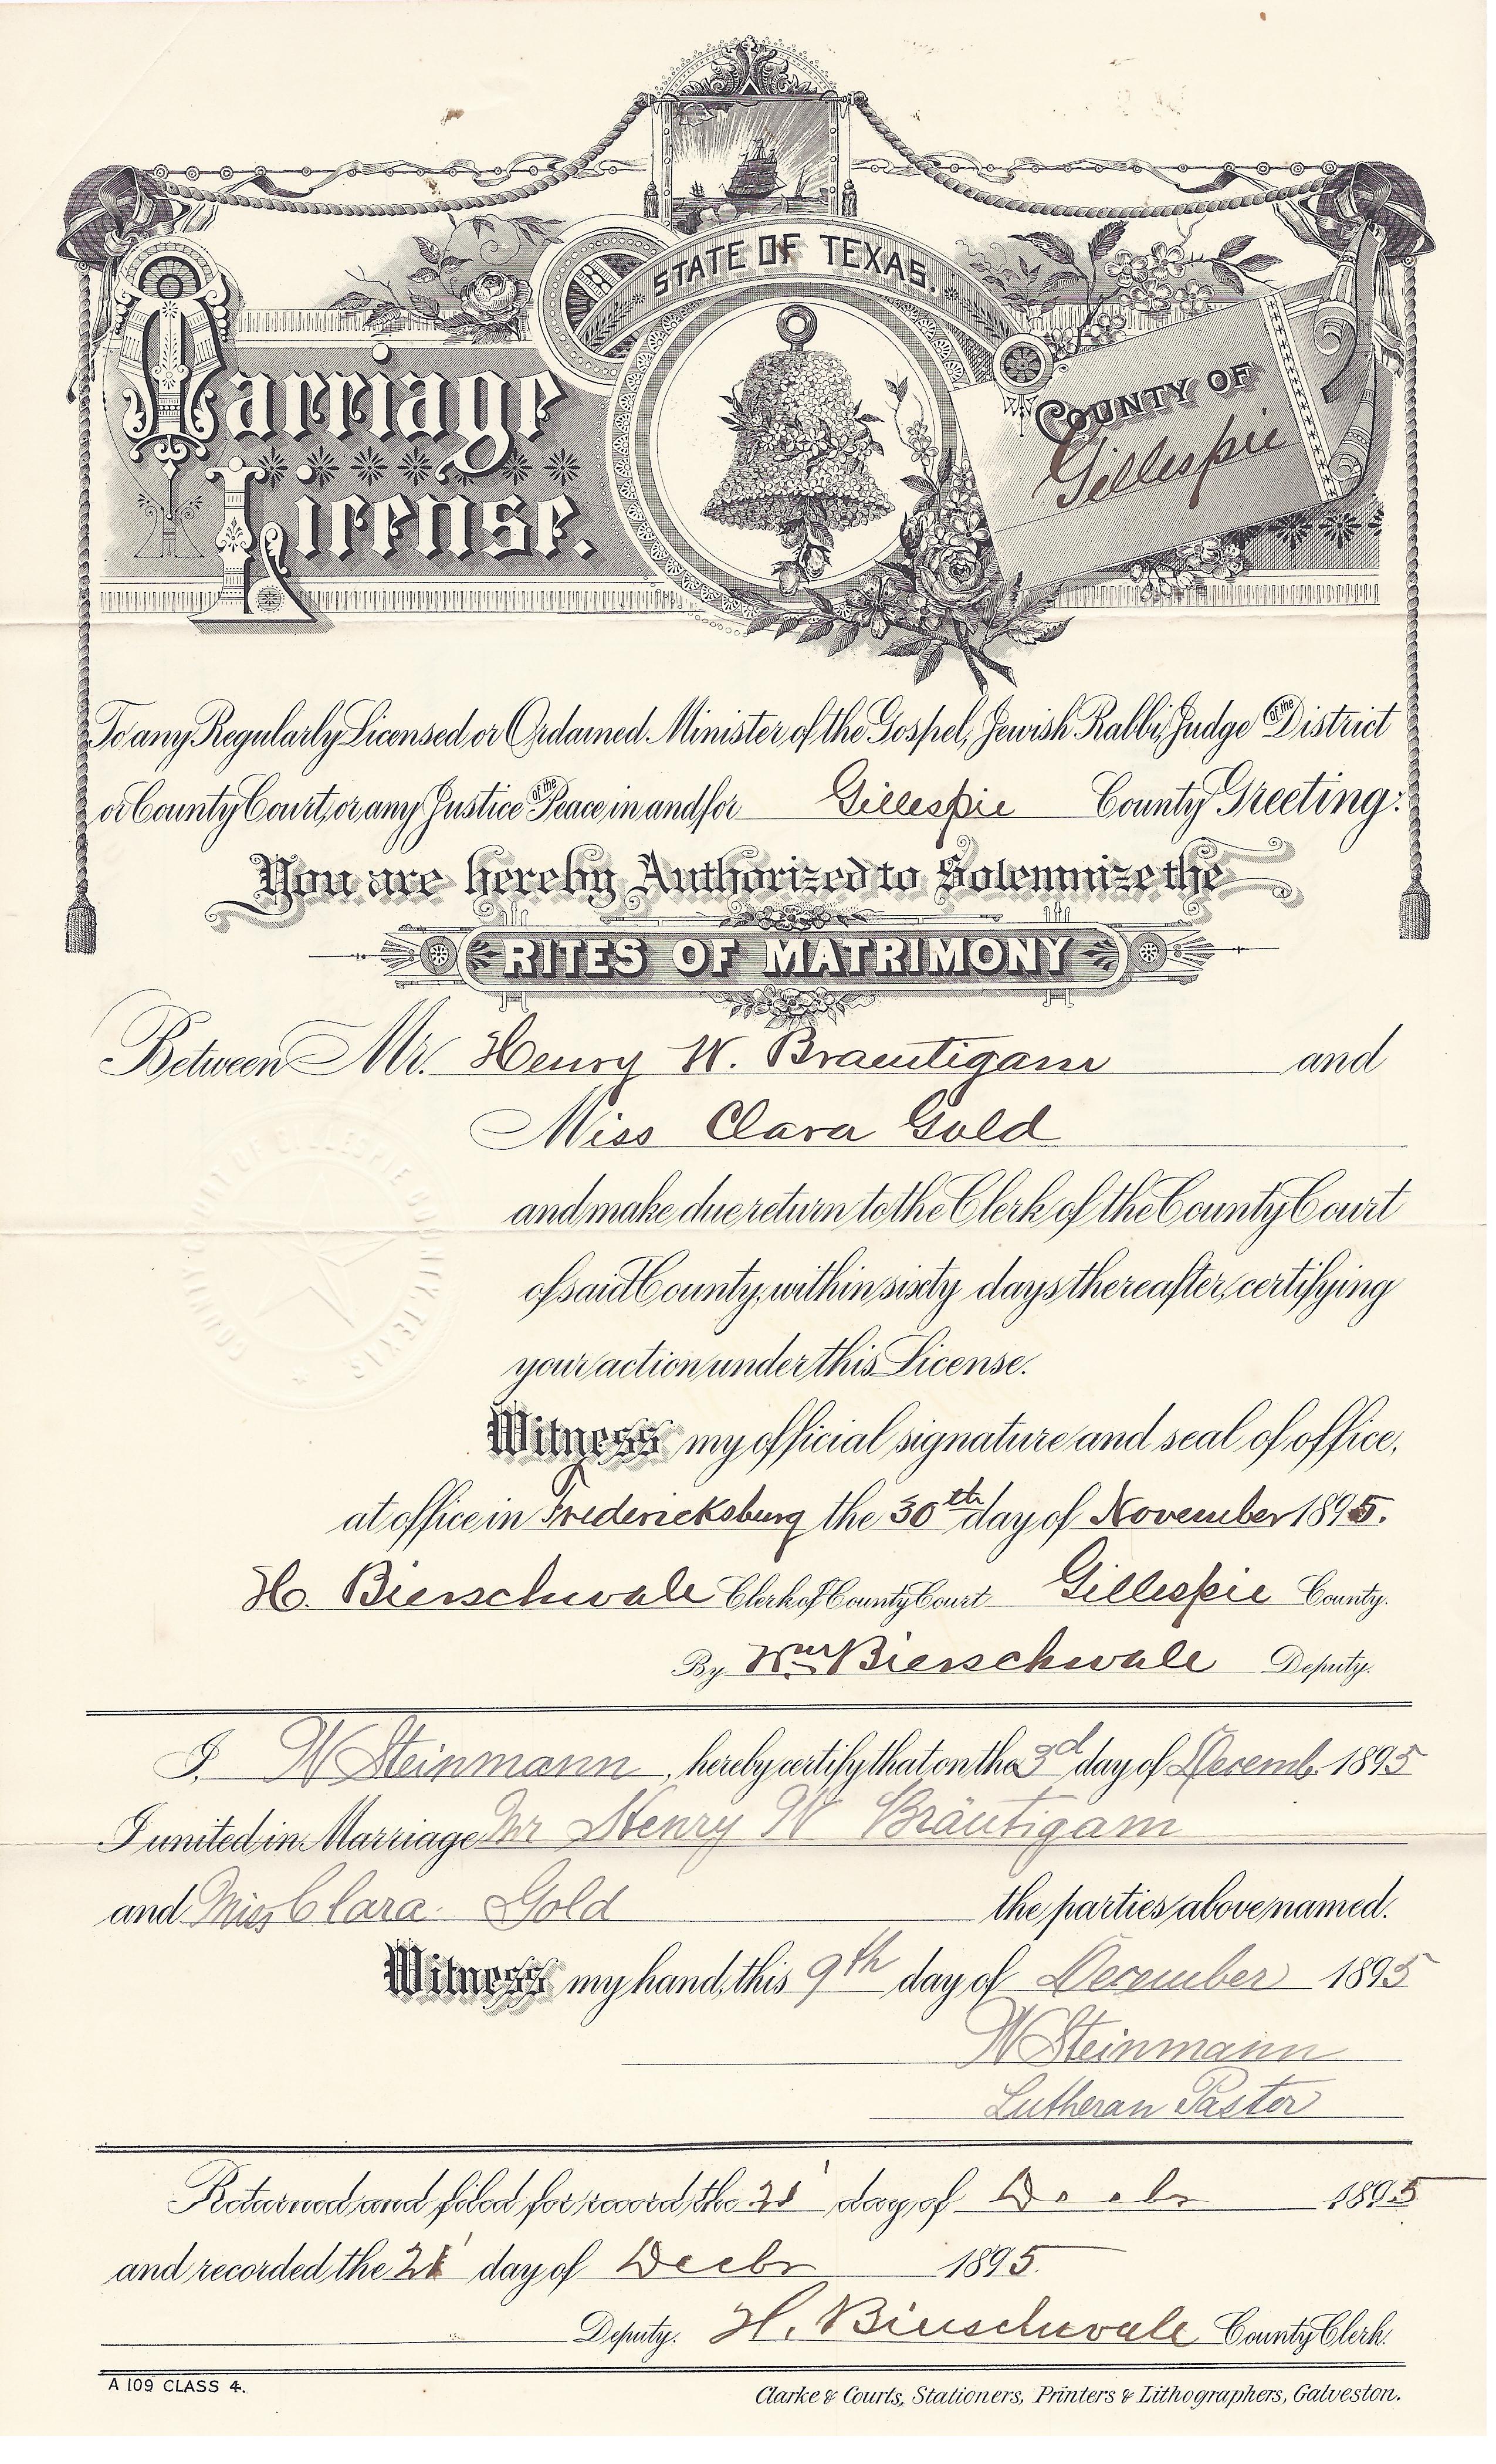 Henrybraeutigam henry braeutigam and clara gold marriage license xflitez Image collections